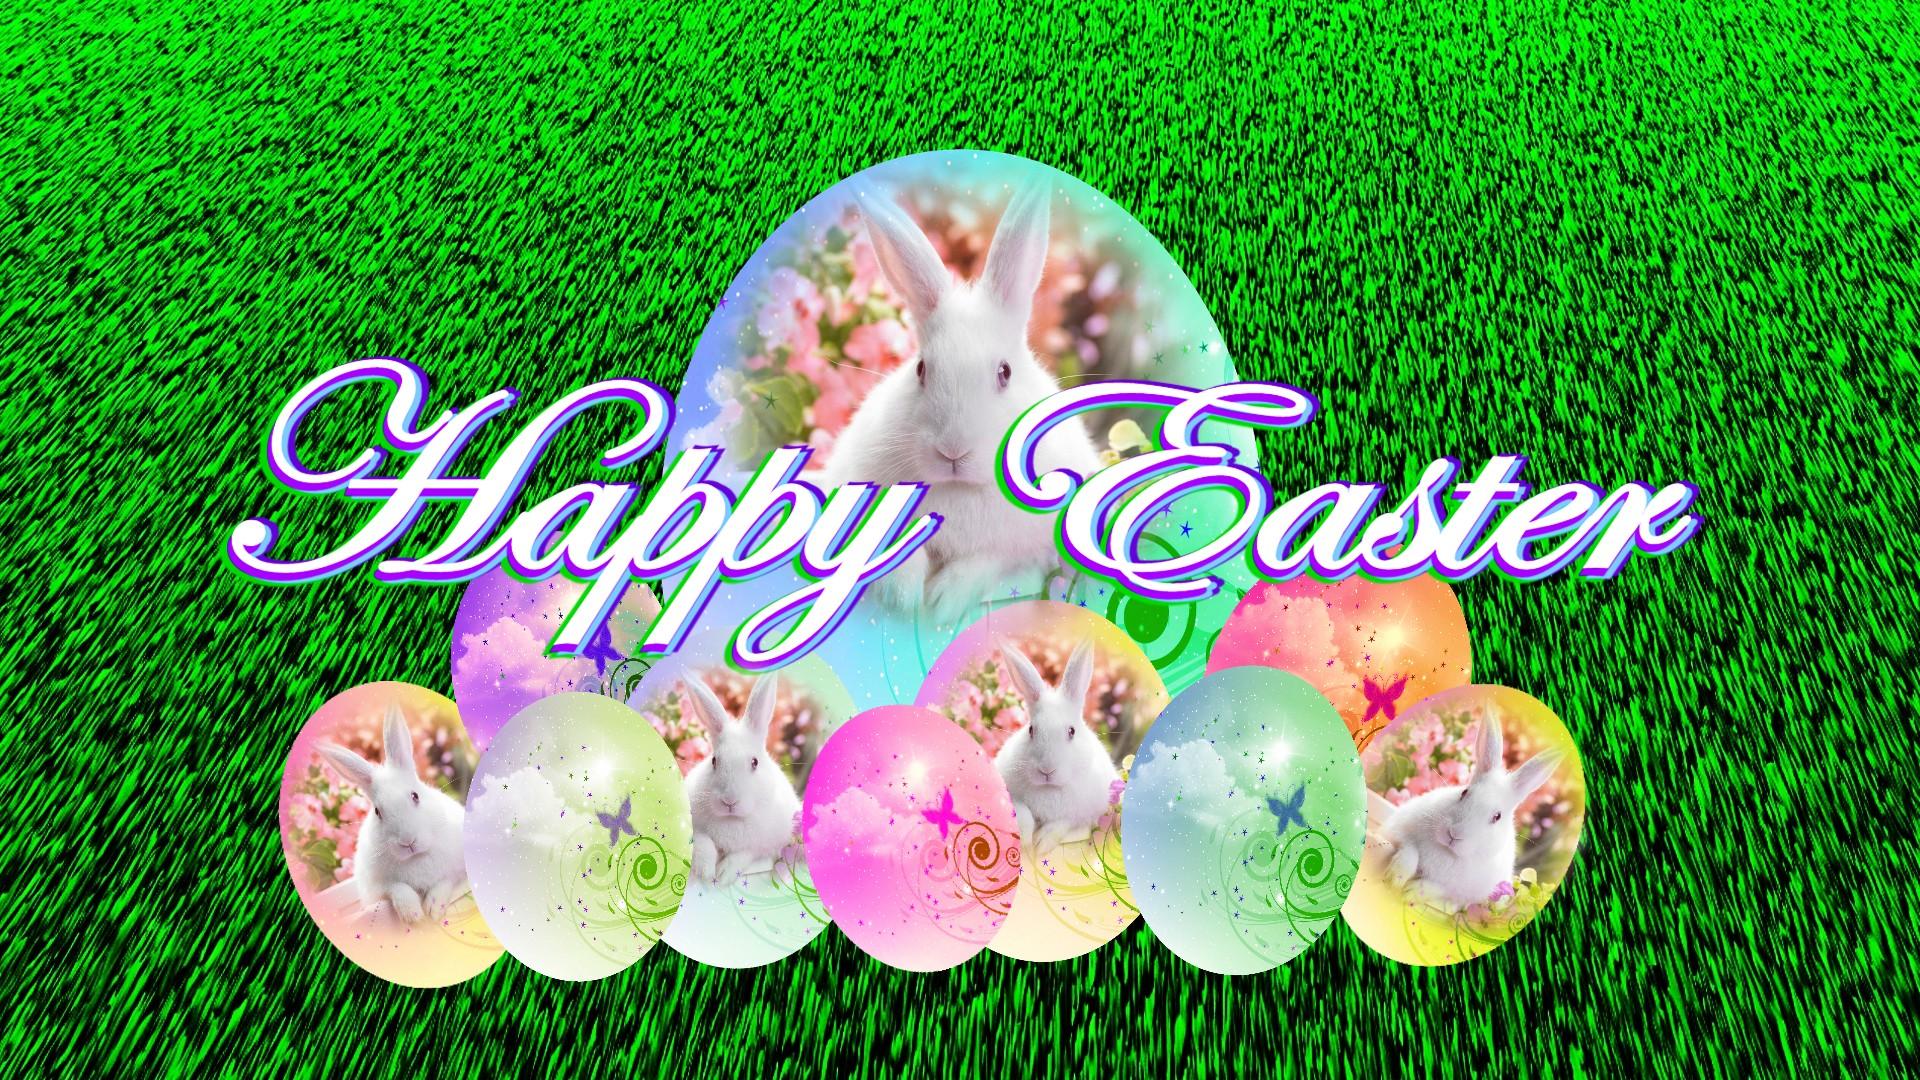 eggs hd holiday and celebration wallpapers wallpapers smajliji com